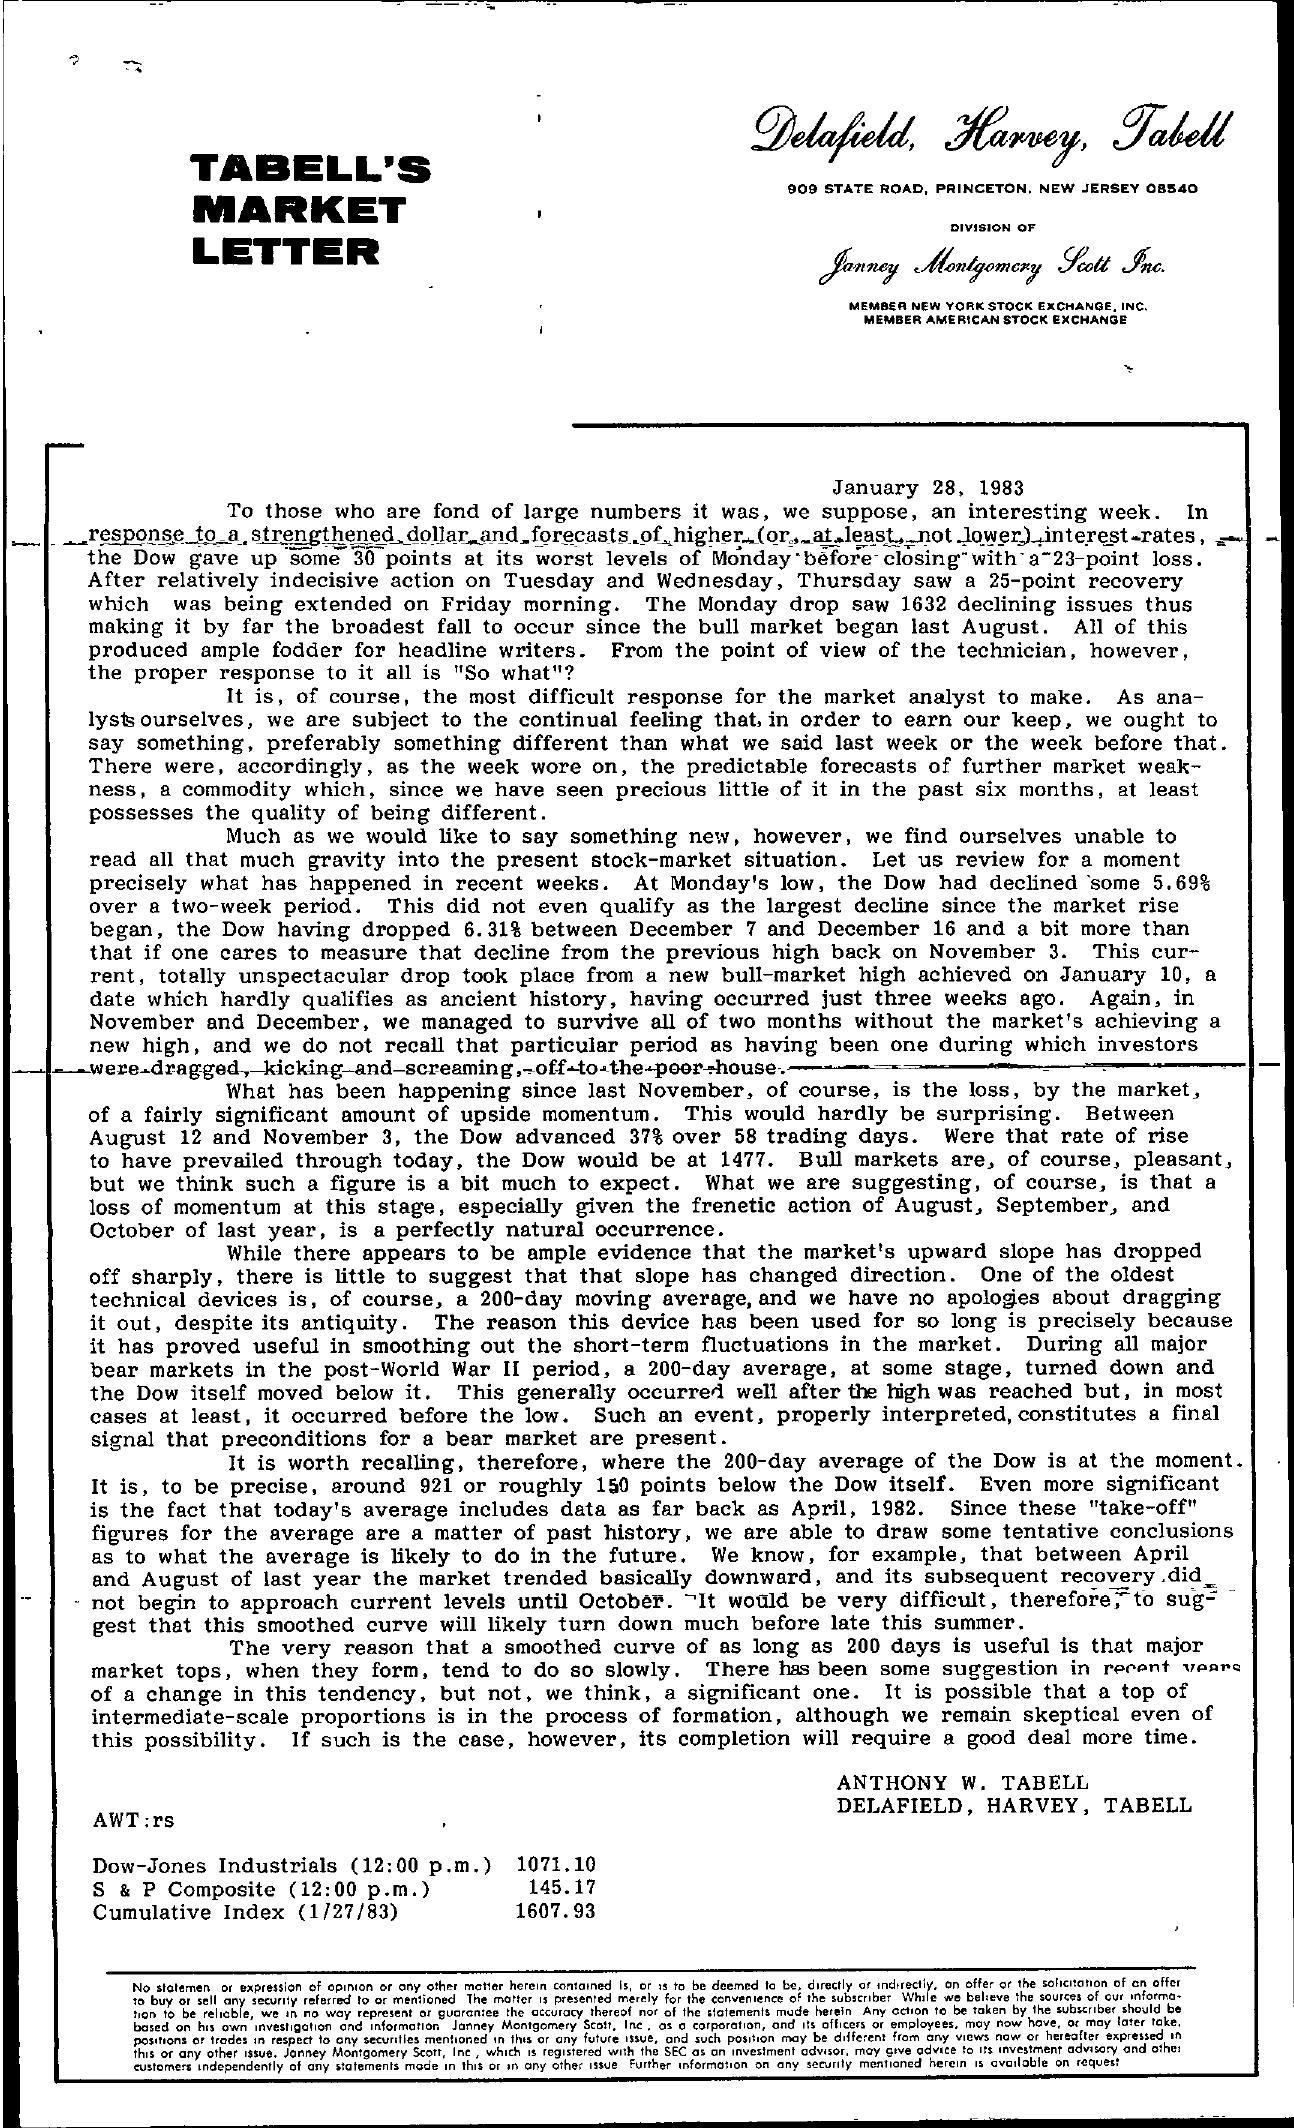 Tabell's Market Letter - January 28, 1983